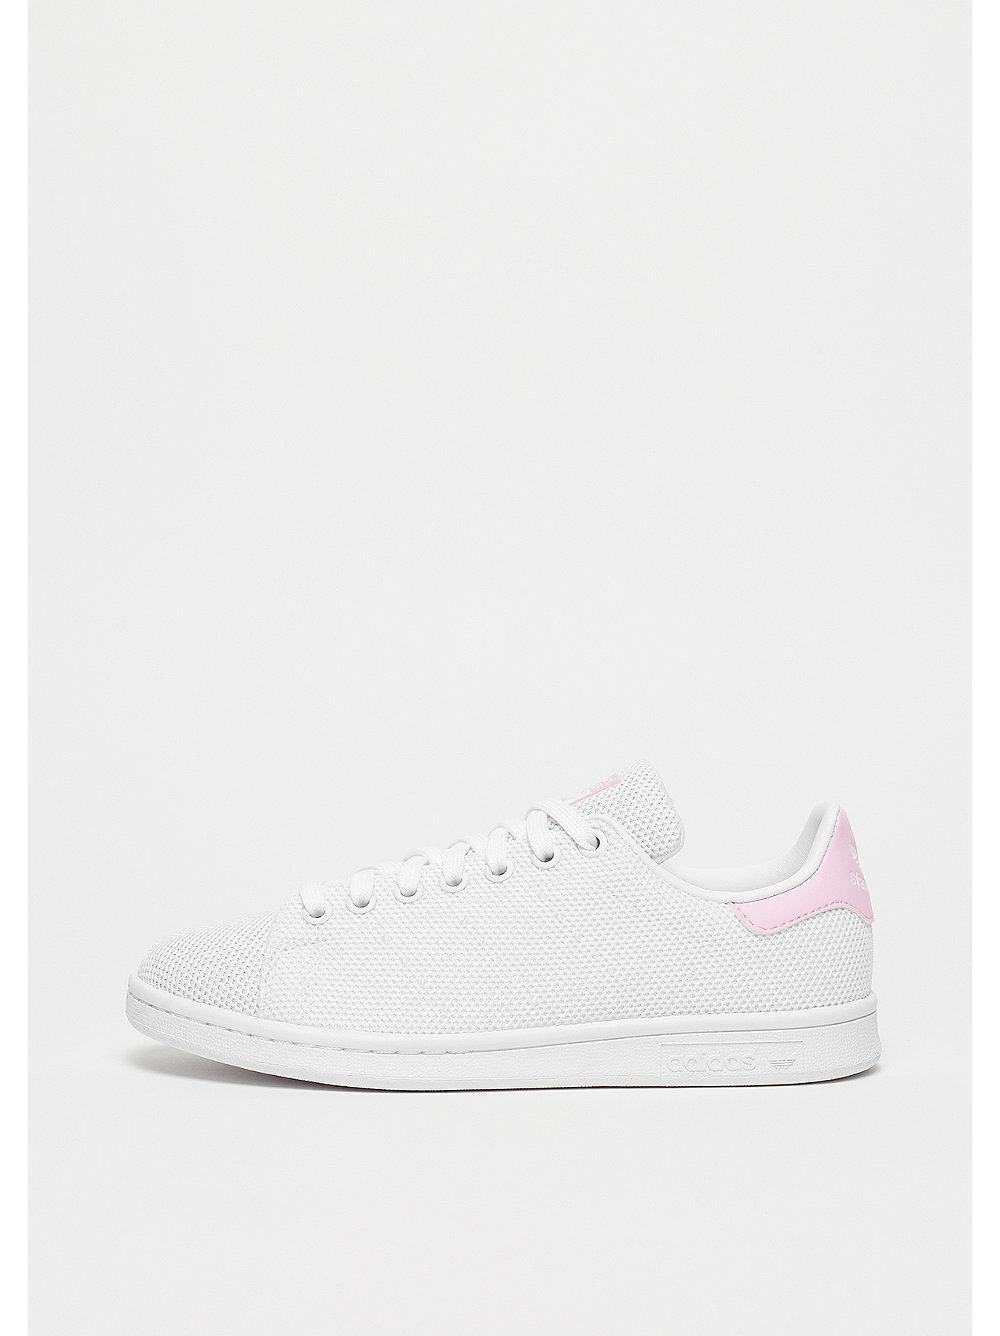 adidas Stan Smith ftwr white-ftwr white-wonder pink